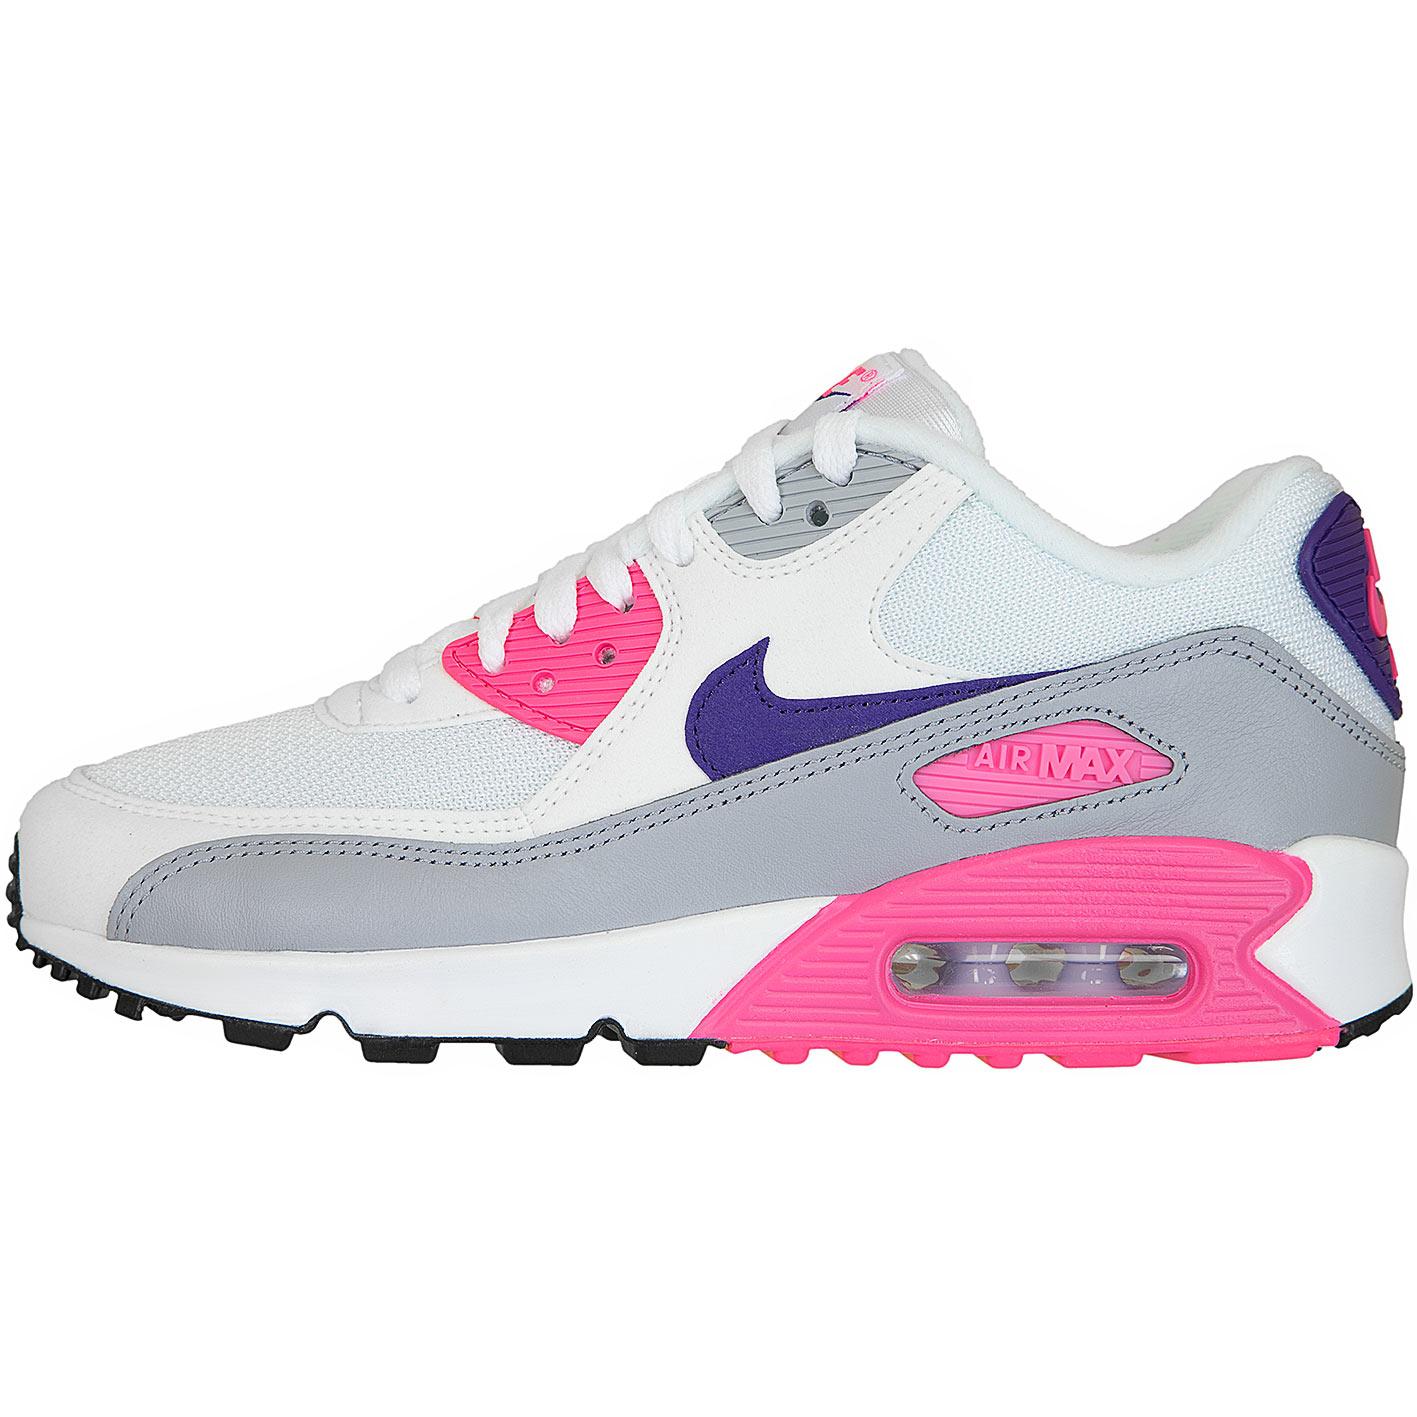 purchase cheap 74793 1f817 Nike Damen Sneaker Air Max 90 weißpink